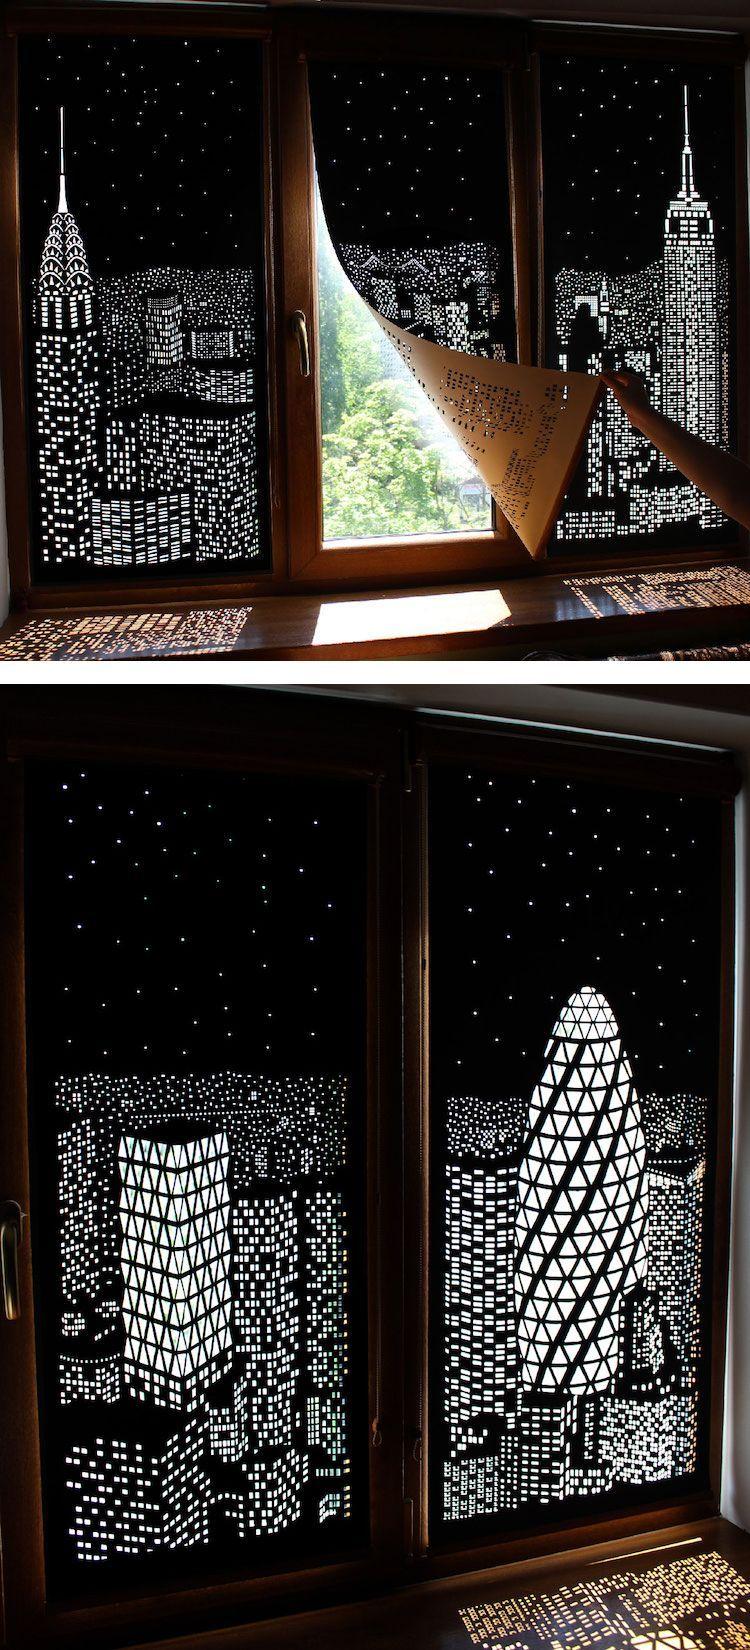 Ukrainian Designers Holeroll Have Created A Unique Window